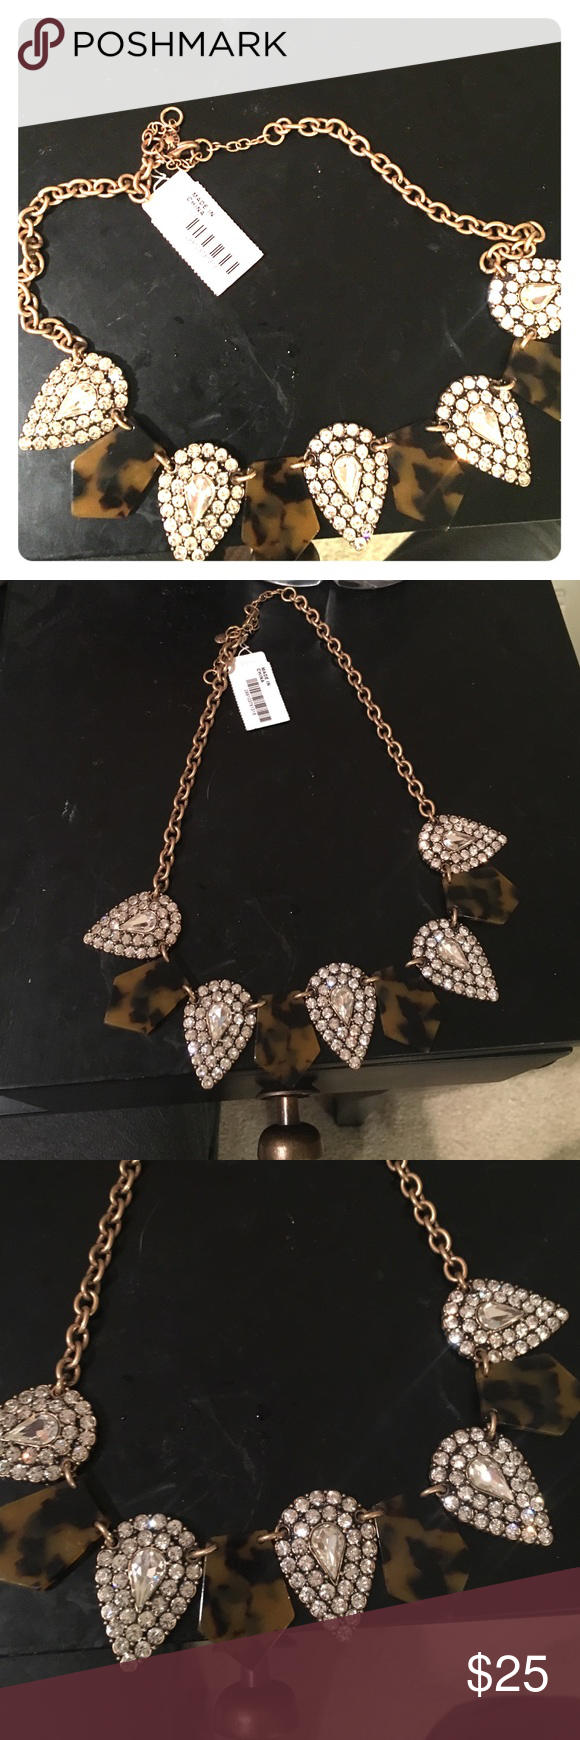 Jcrew necklace leopard pendant necklace brand new never worn j